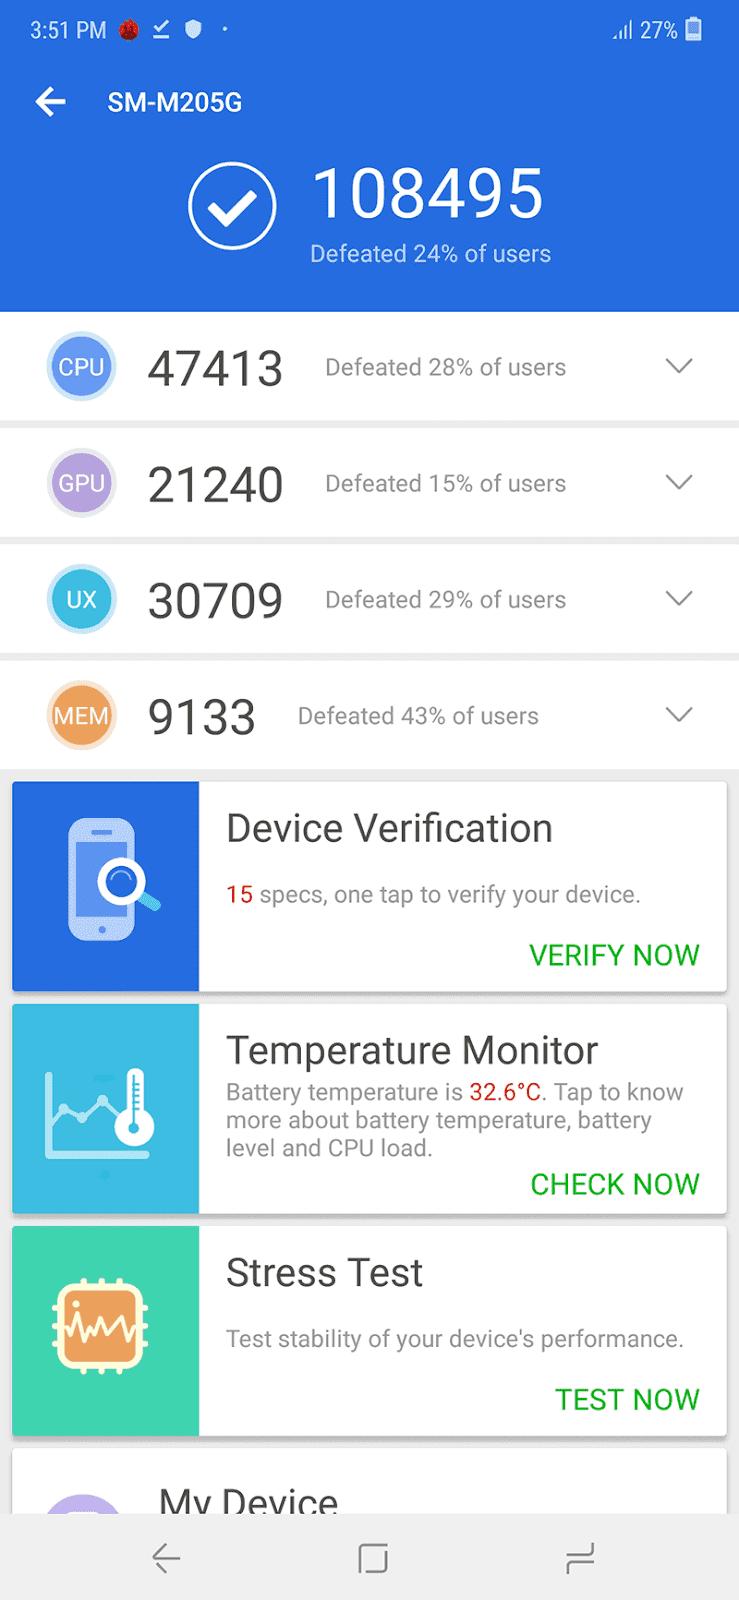 Samsung Galaxy M20's AnTuTu benchmark score